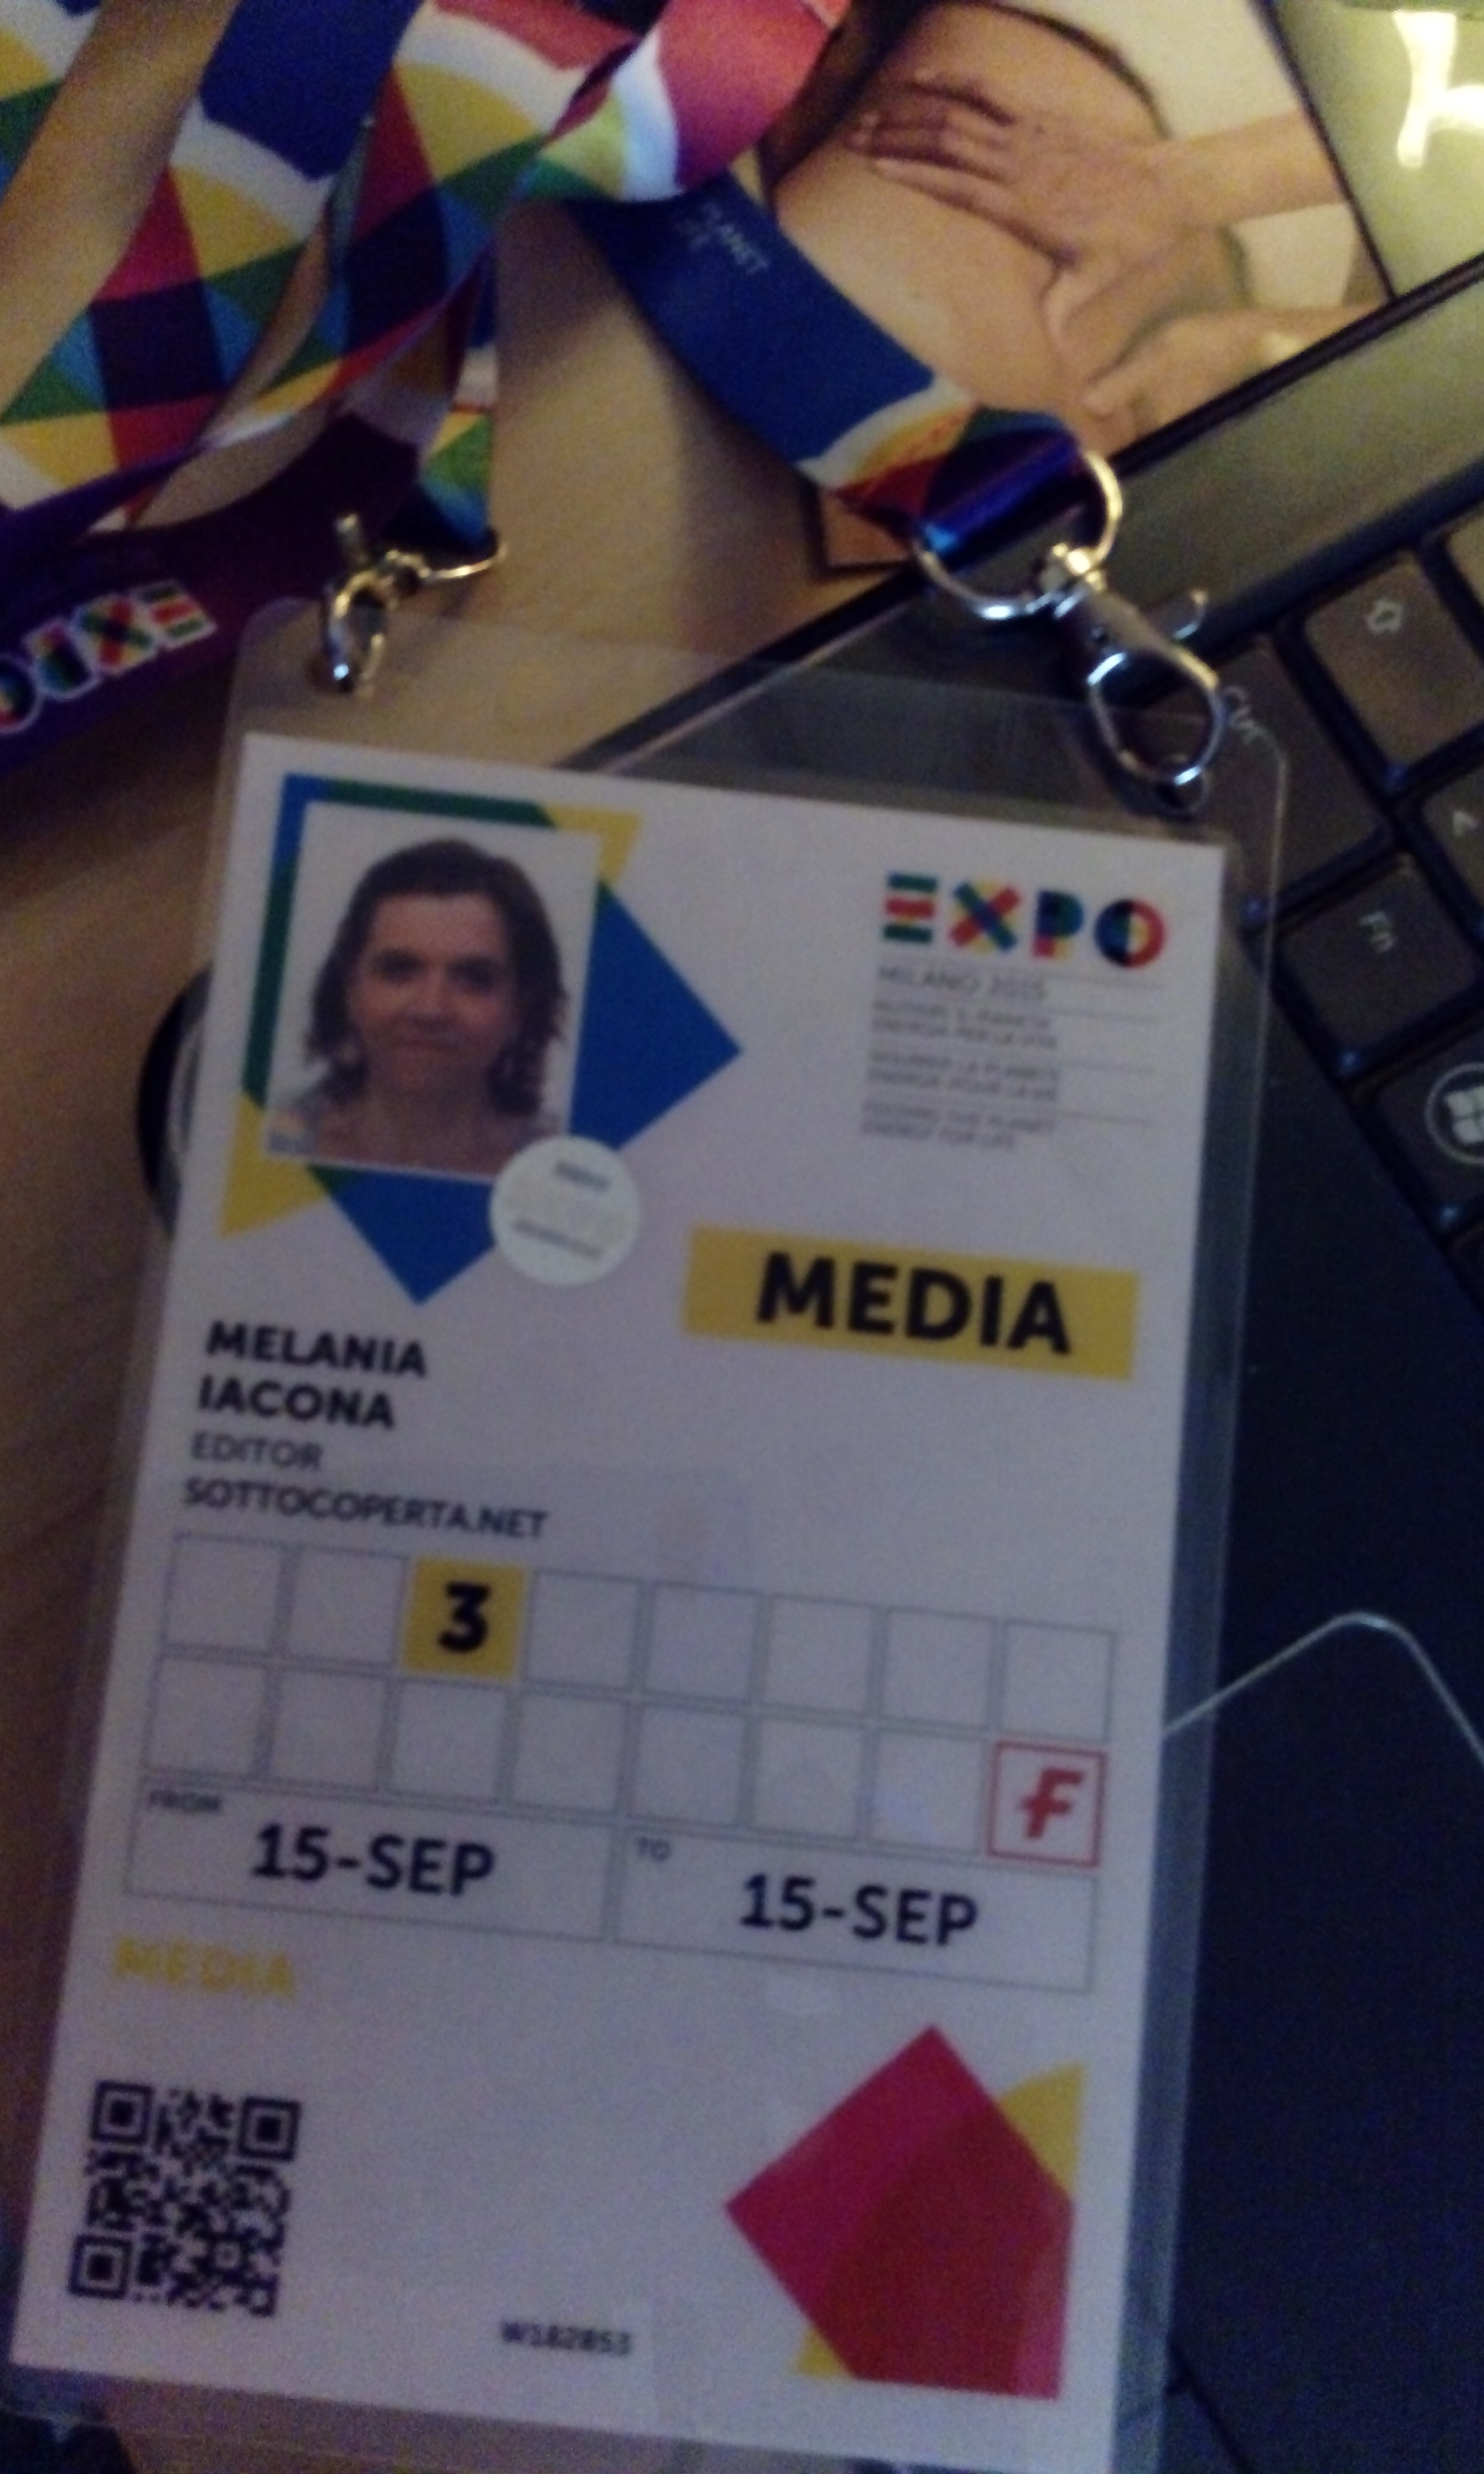 Pass Expo Influencer